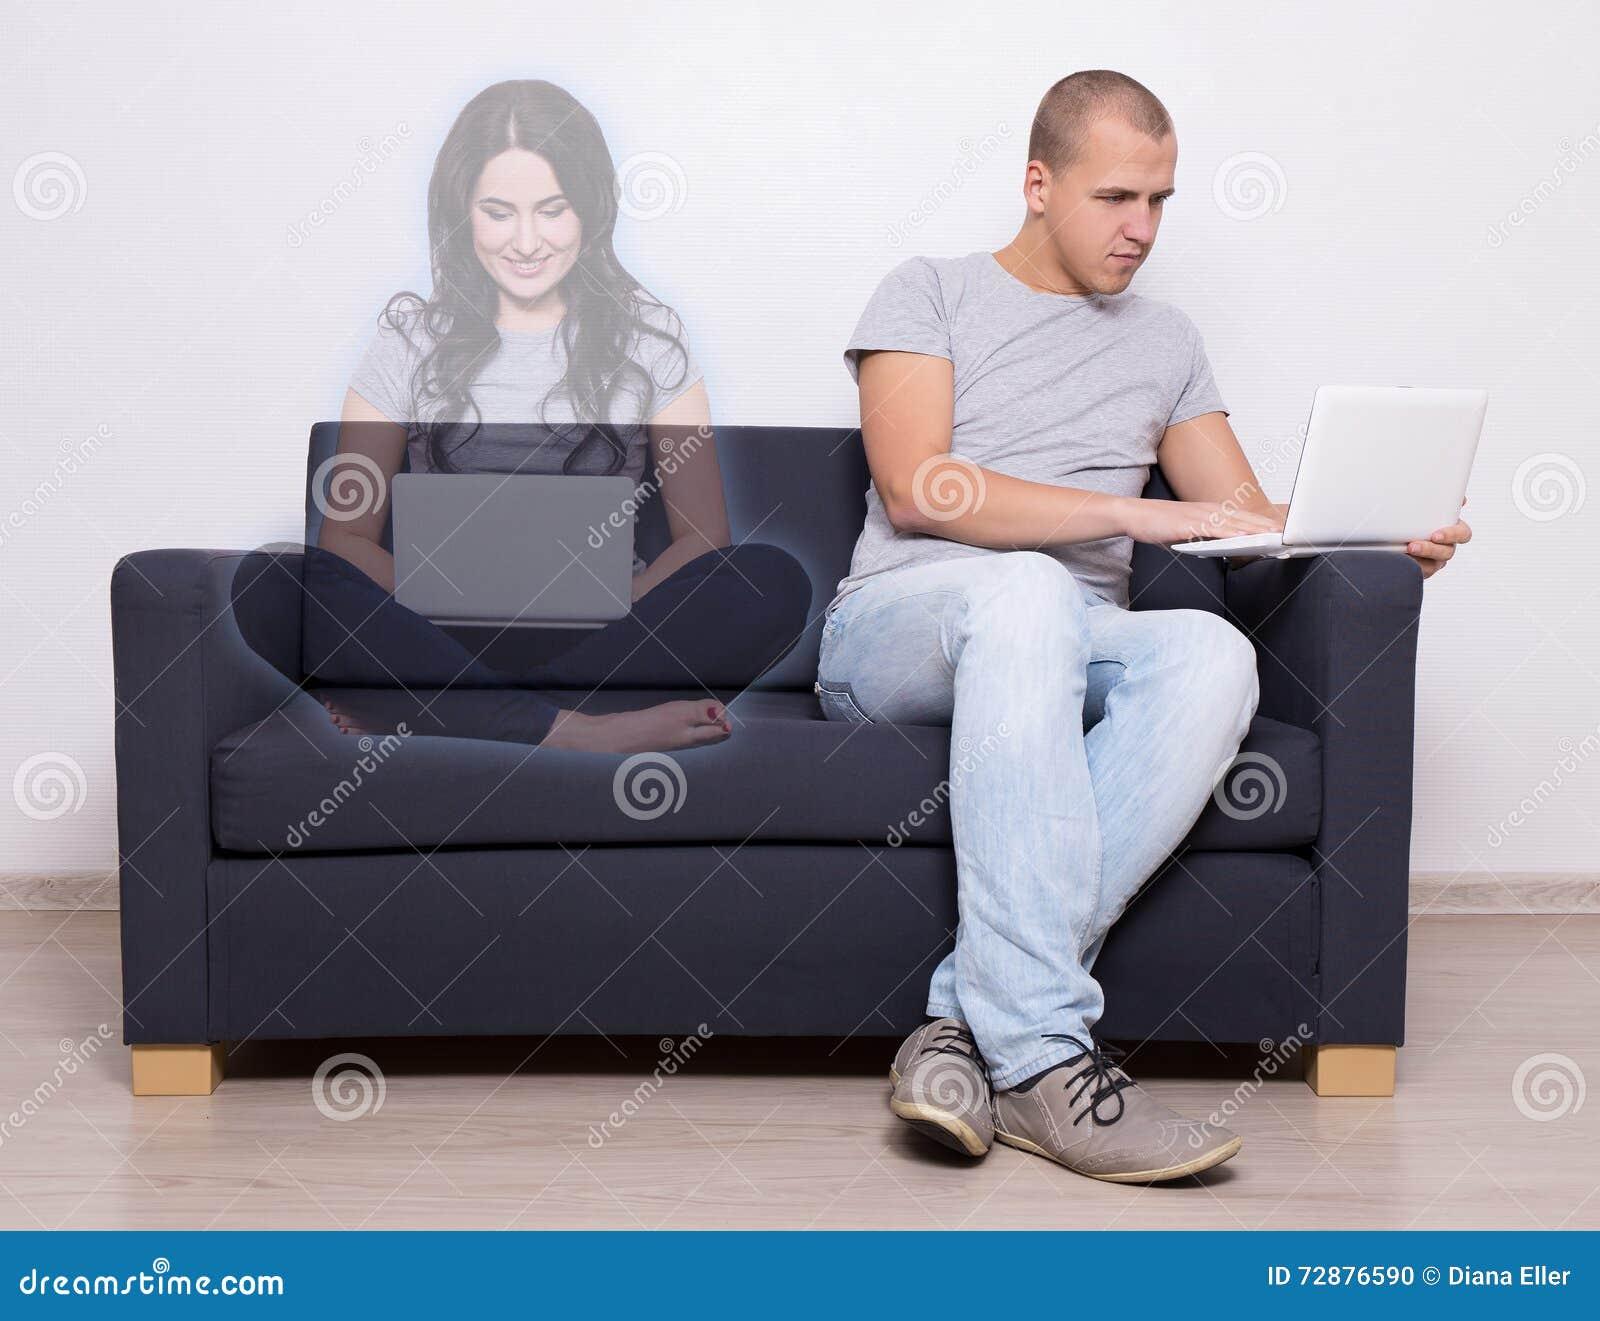 Онлайн концепция датировка - красивый человек сидя на софе и chattin